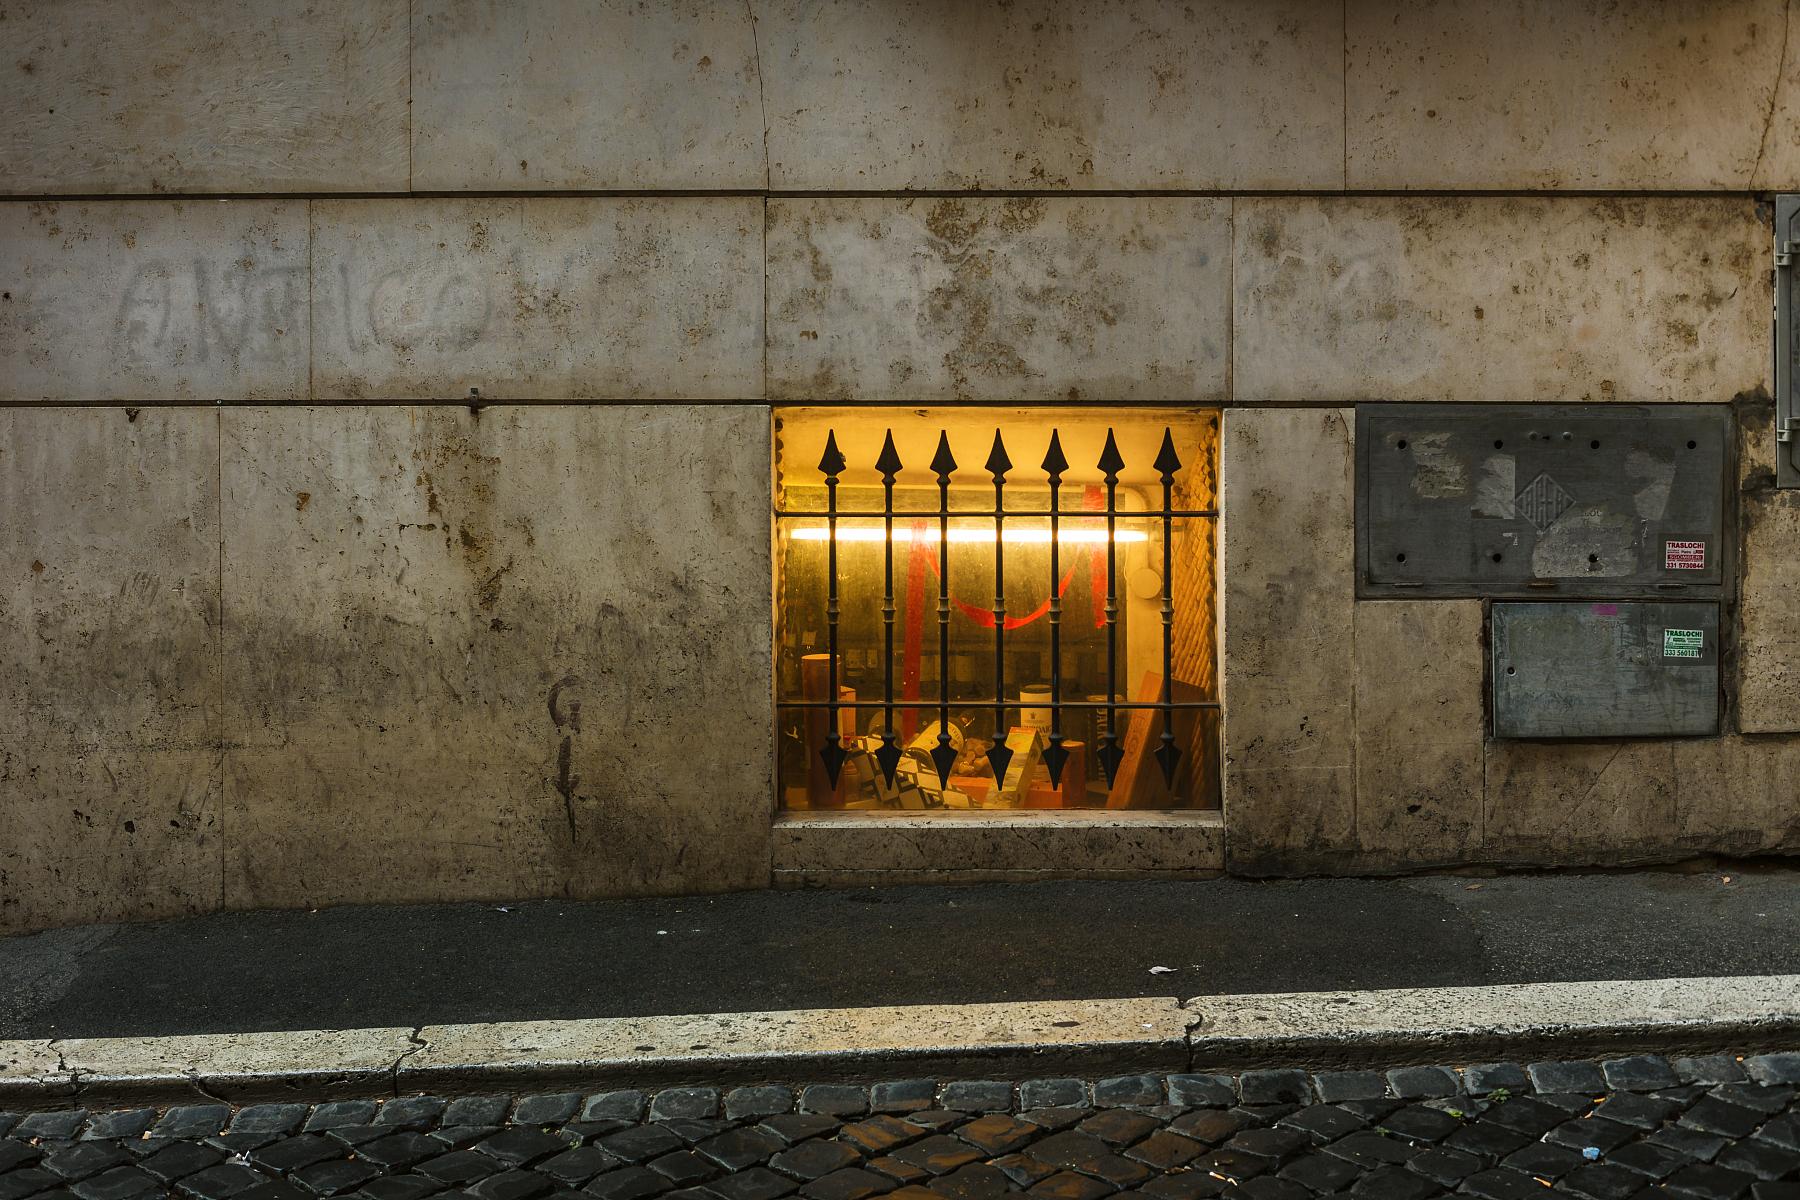 A street in Rome.